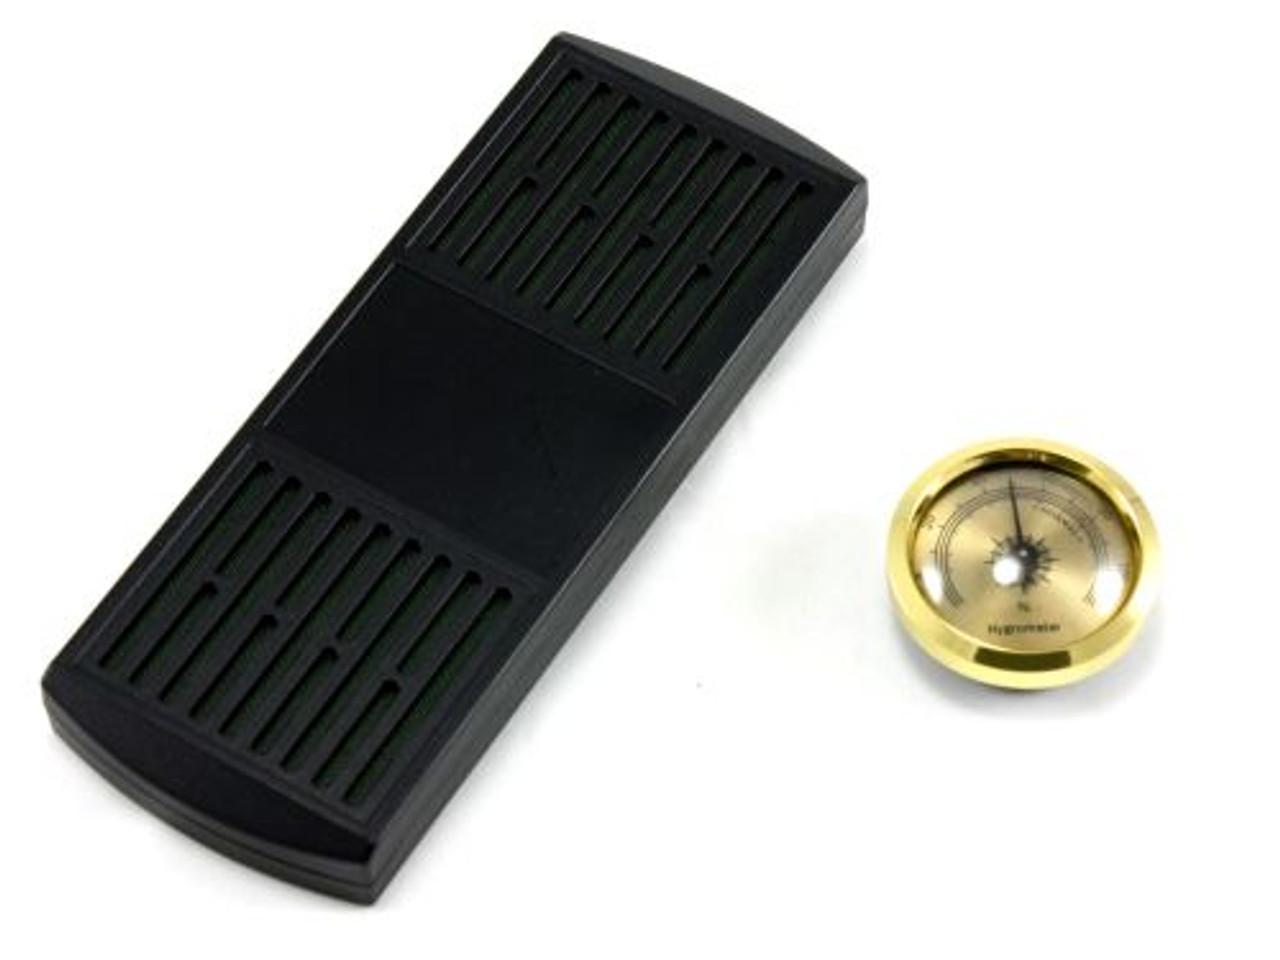 Florentino Black Cigar Humidor